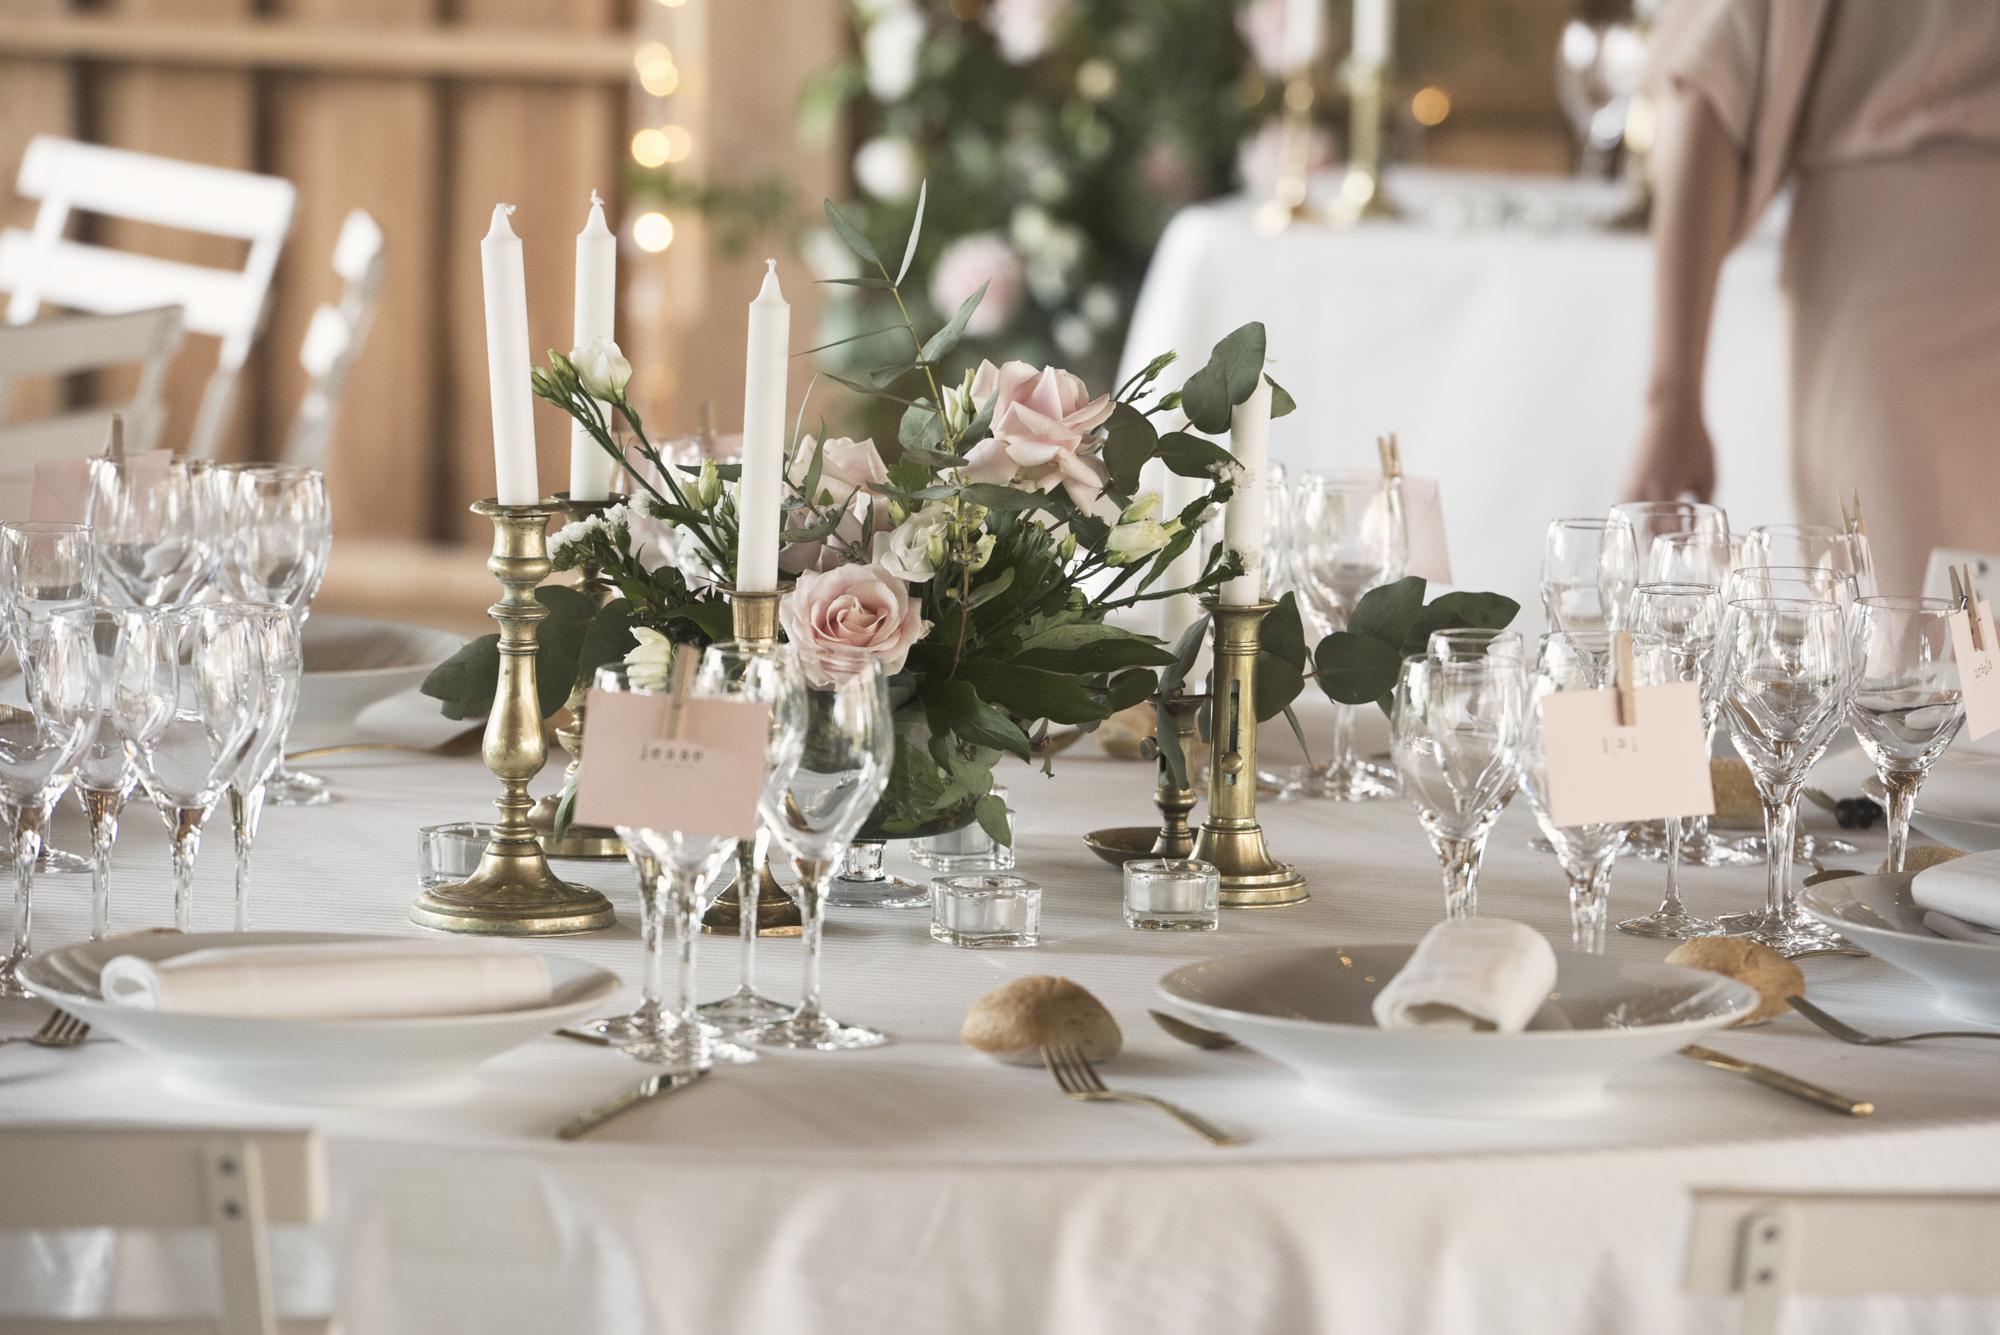 Fine art French wedding styling